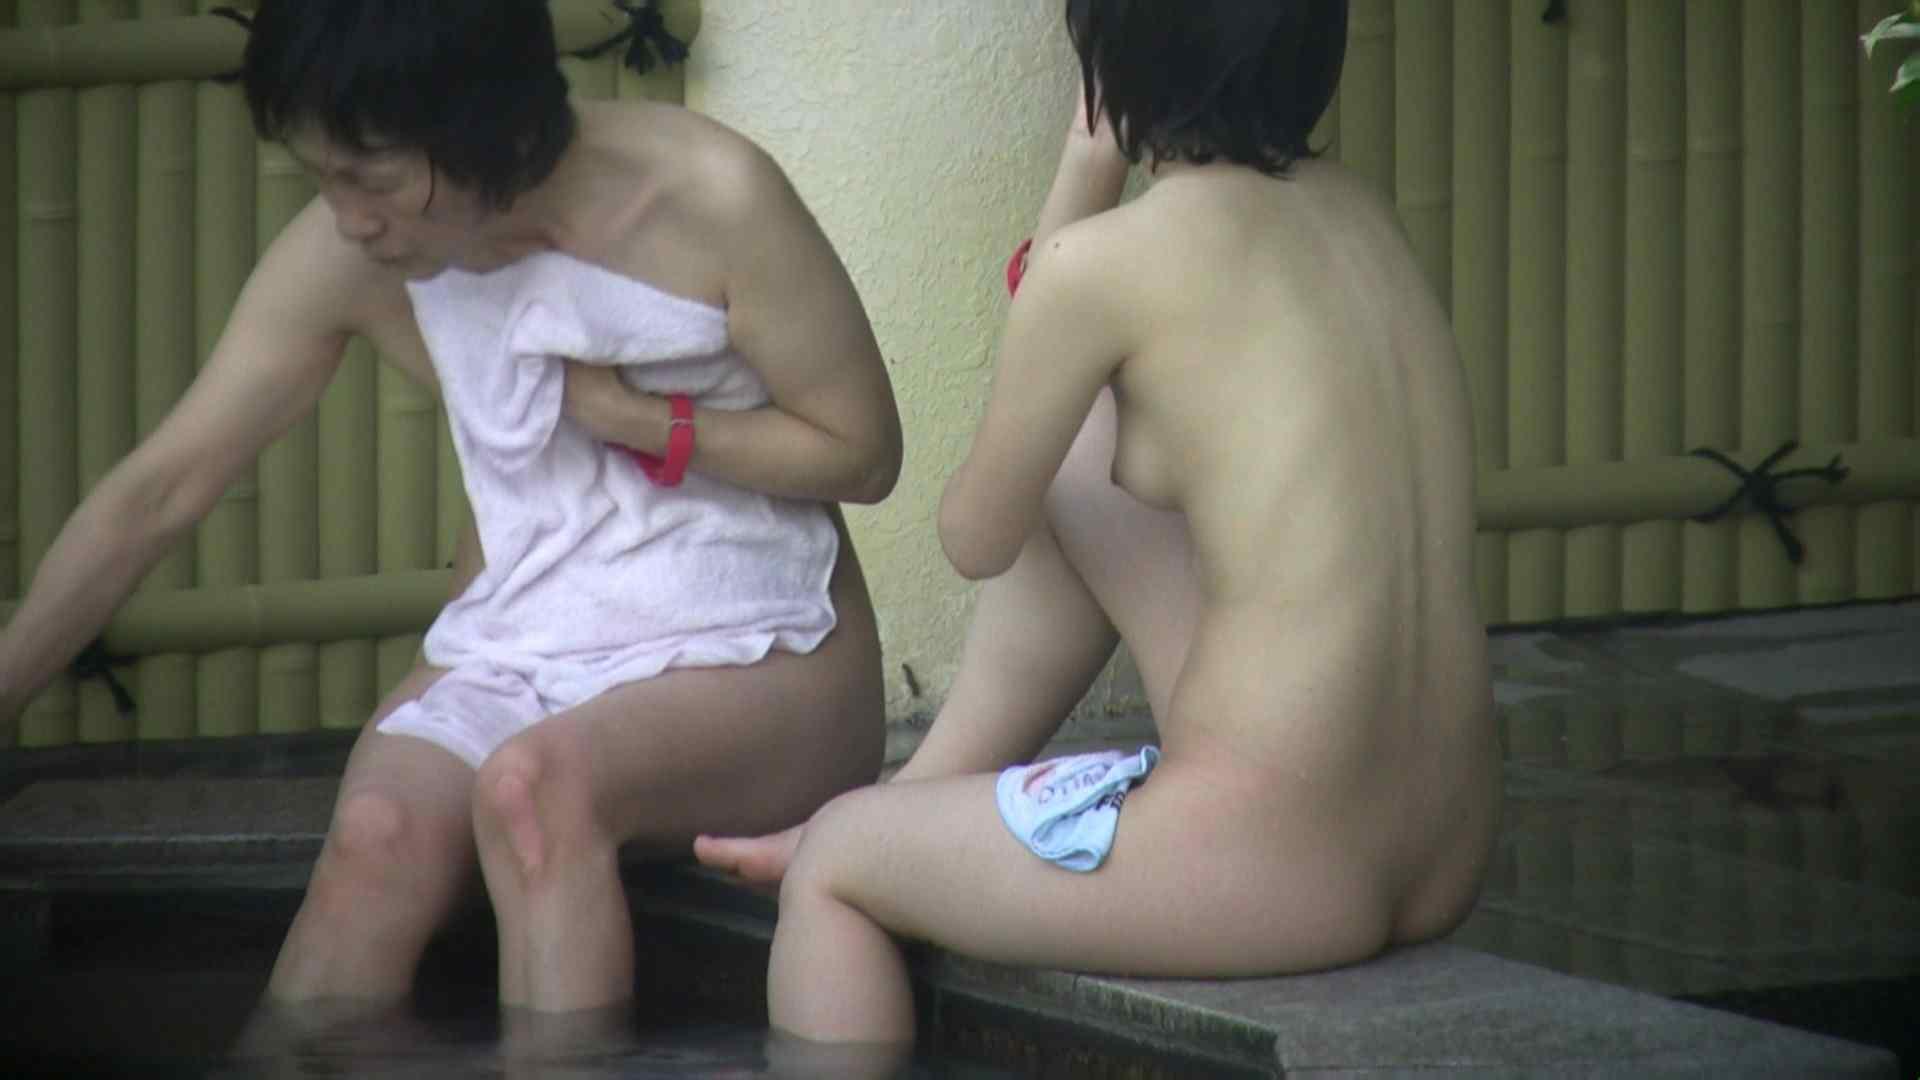 Aquaな露天風呂Vol.06【VIP】 HなOL | 盗撮  86pic 54